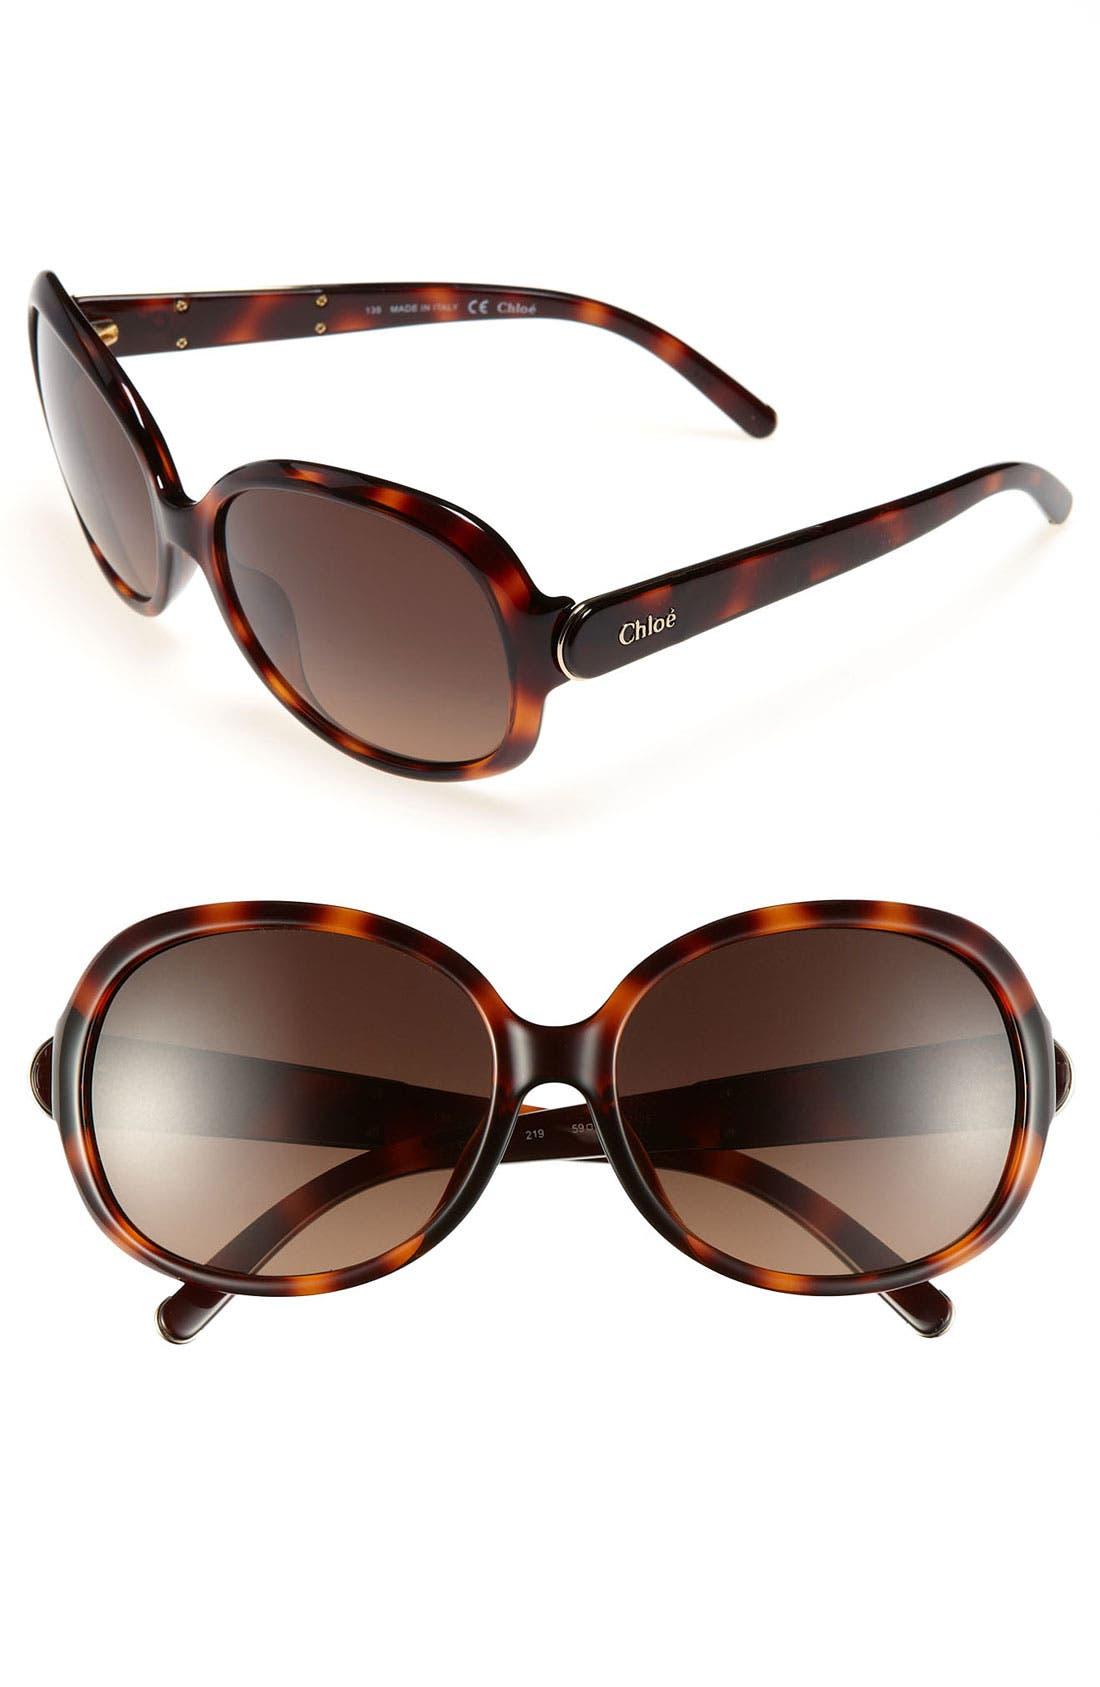 Alternate Image 1 Selected - Chloé 59mm Oversized Sunglasses (Online Only)